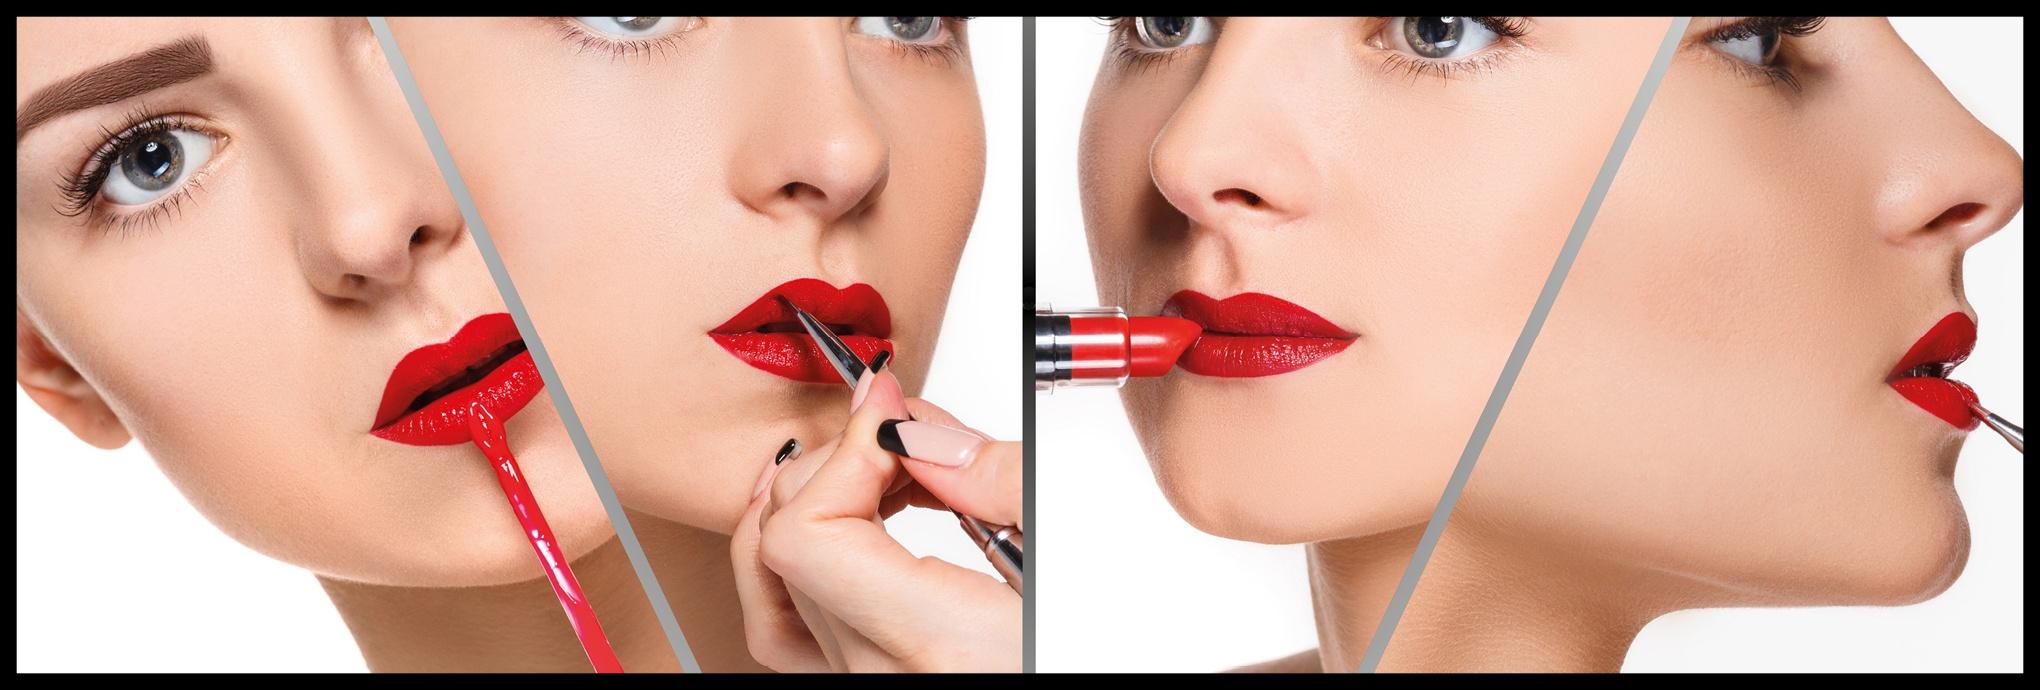 WMI_Search_Lipstick.jpg